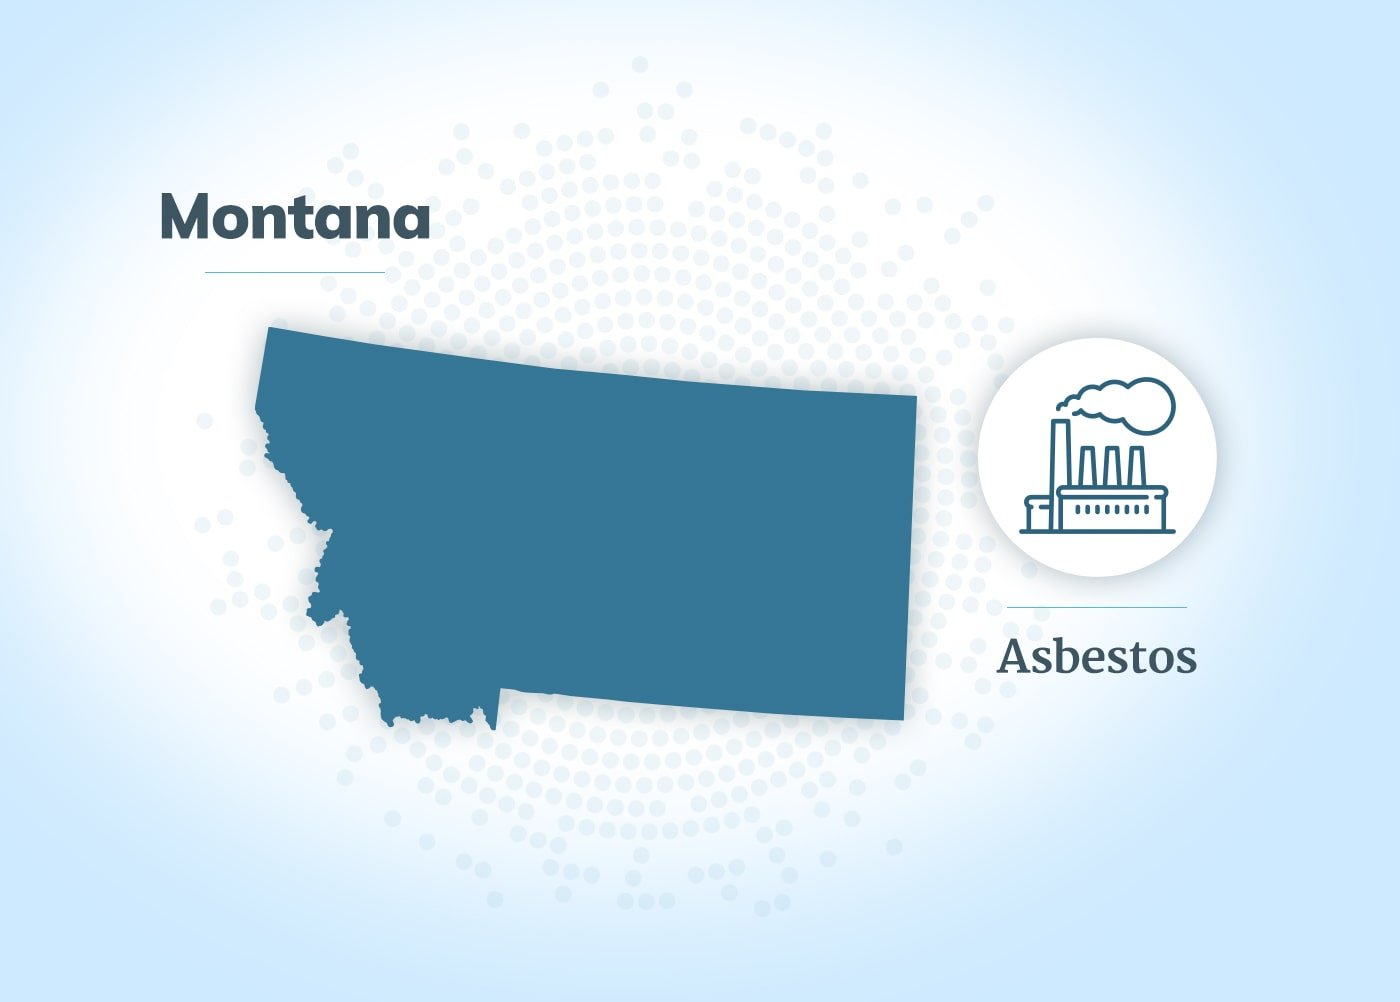 Asbestos exposure in Montana